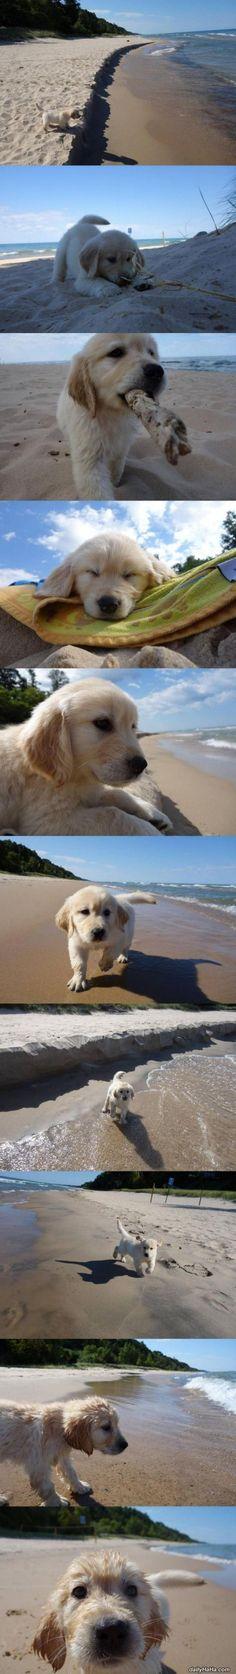 Cute_Little_Puppy_Beach